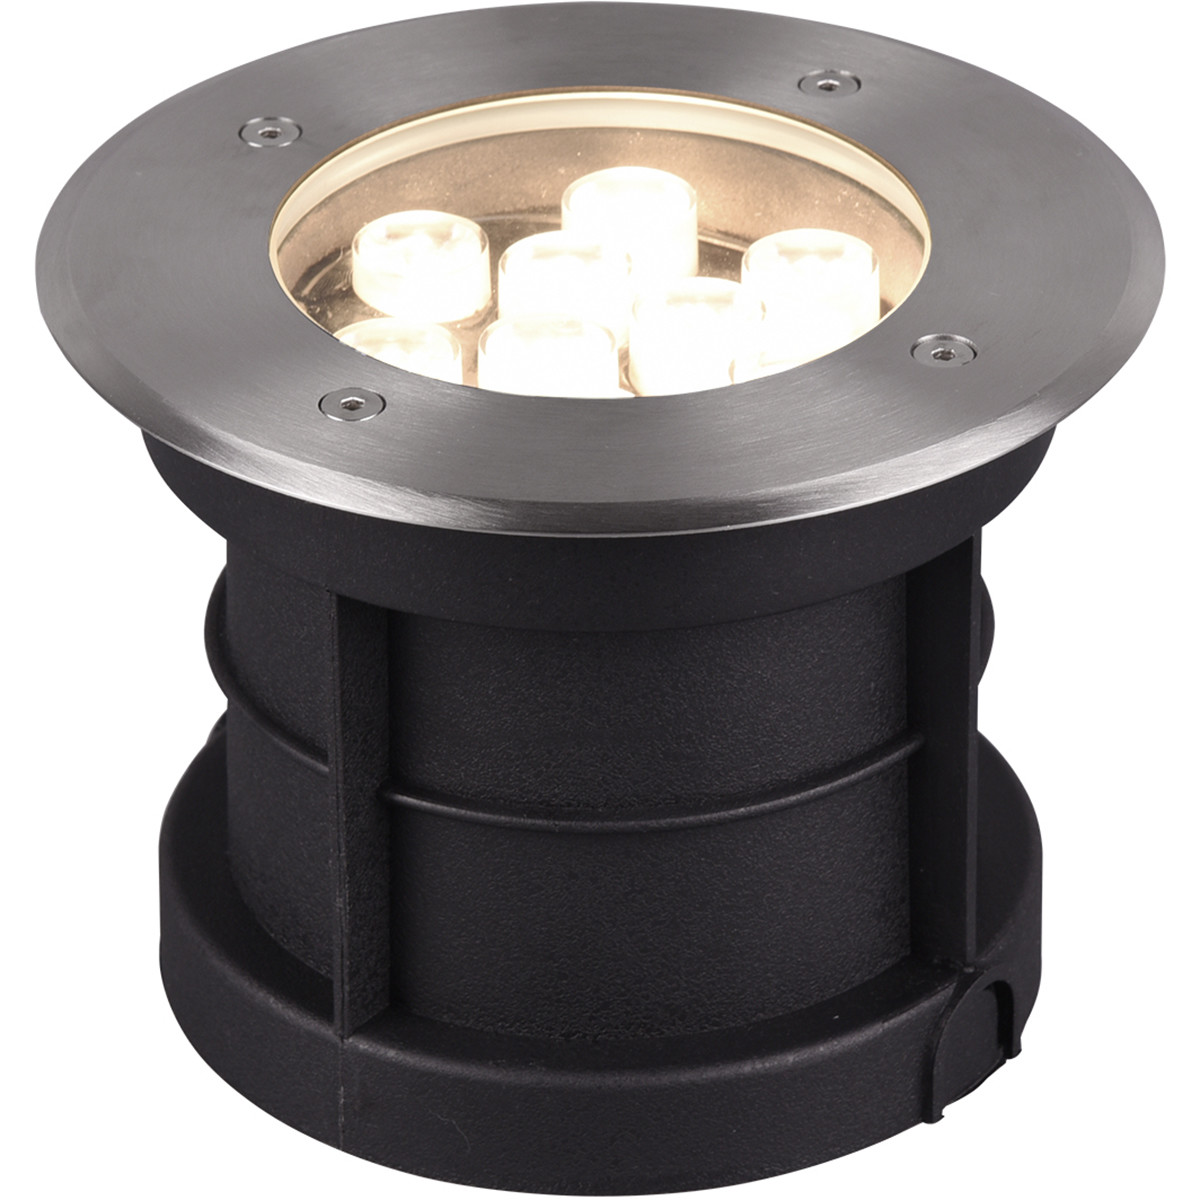 LED Grondspot - Trion Baliyi - Inbouw Rond - 9W - Waterdicht IP65 - Warm Wit 3000K - Mat Nikkel - RV